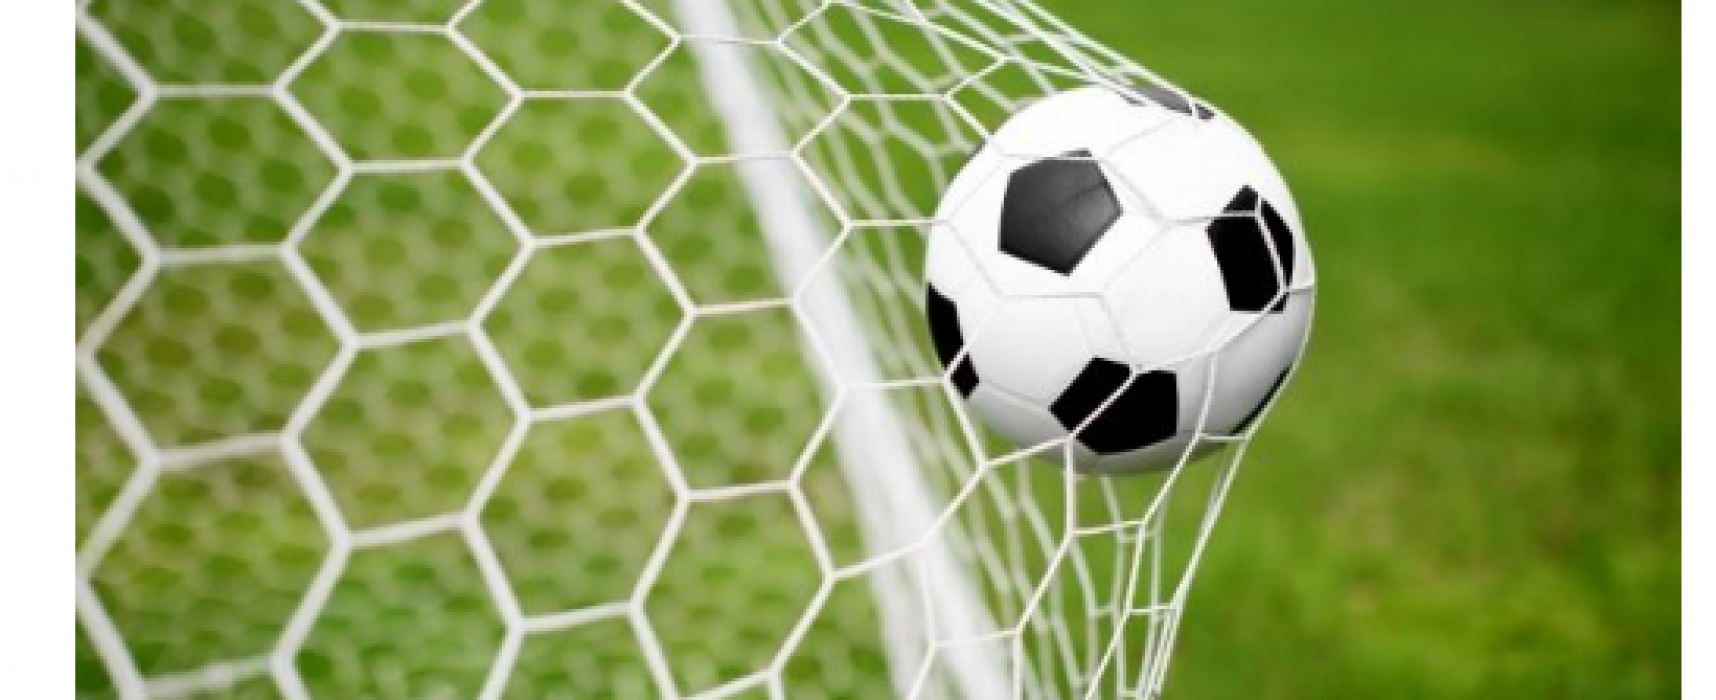 Falso: Ucrania no va a transmitir los partidos del Mundial-2018 en Rusia